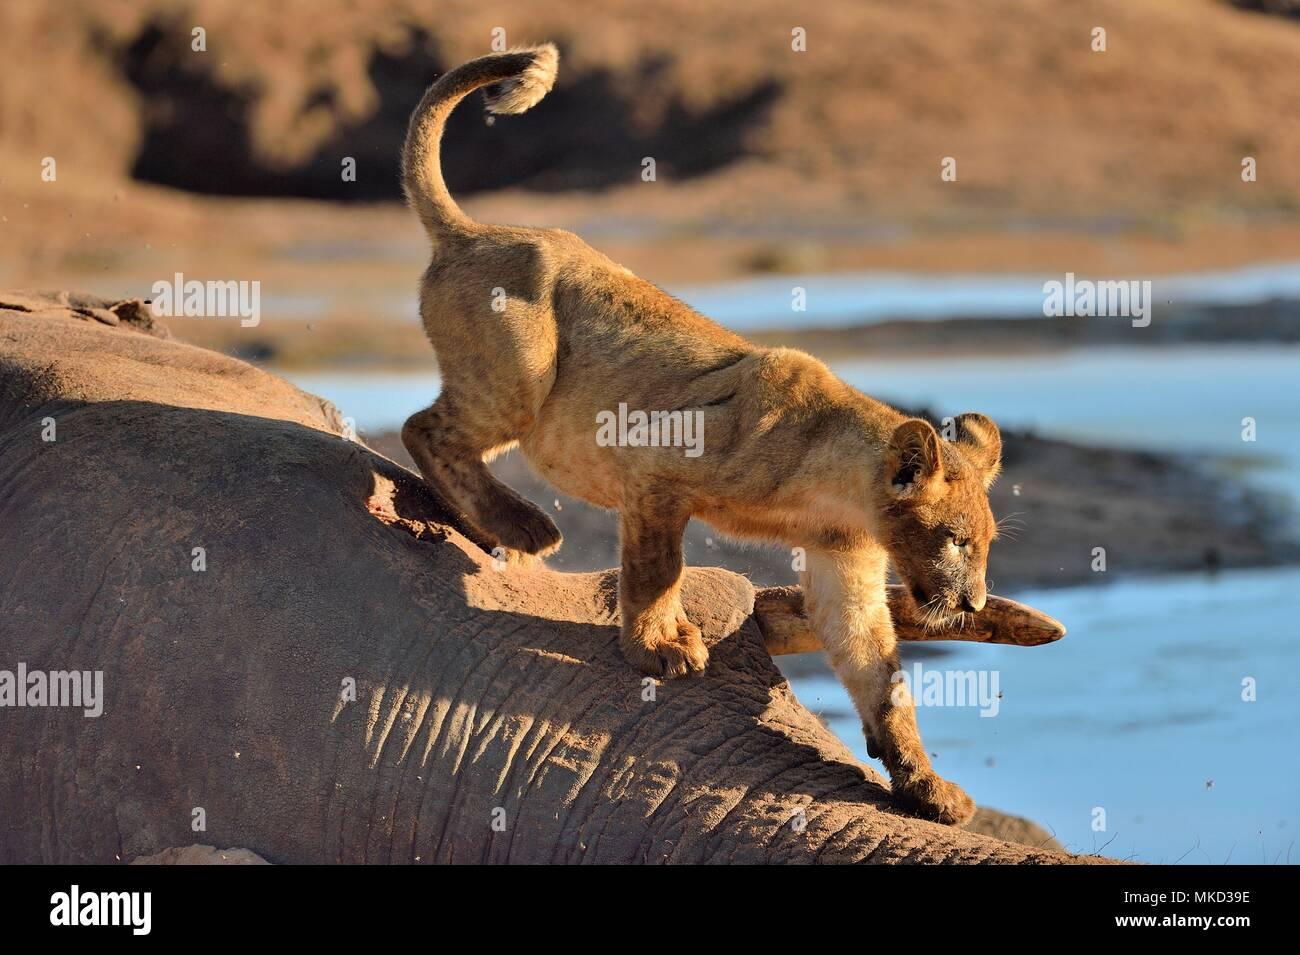 Lion (Panthera leo) Lion cub on an elephant carcass, Botswana - Stock Image